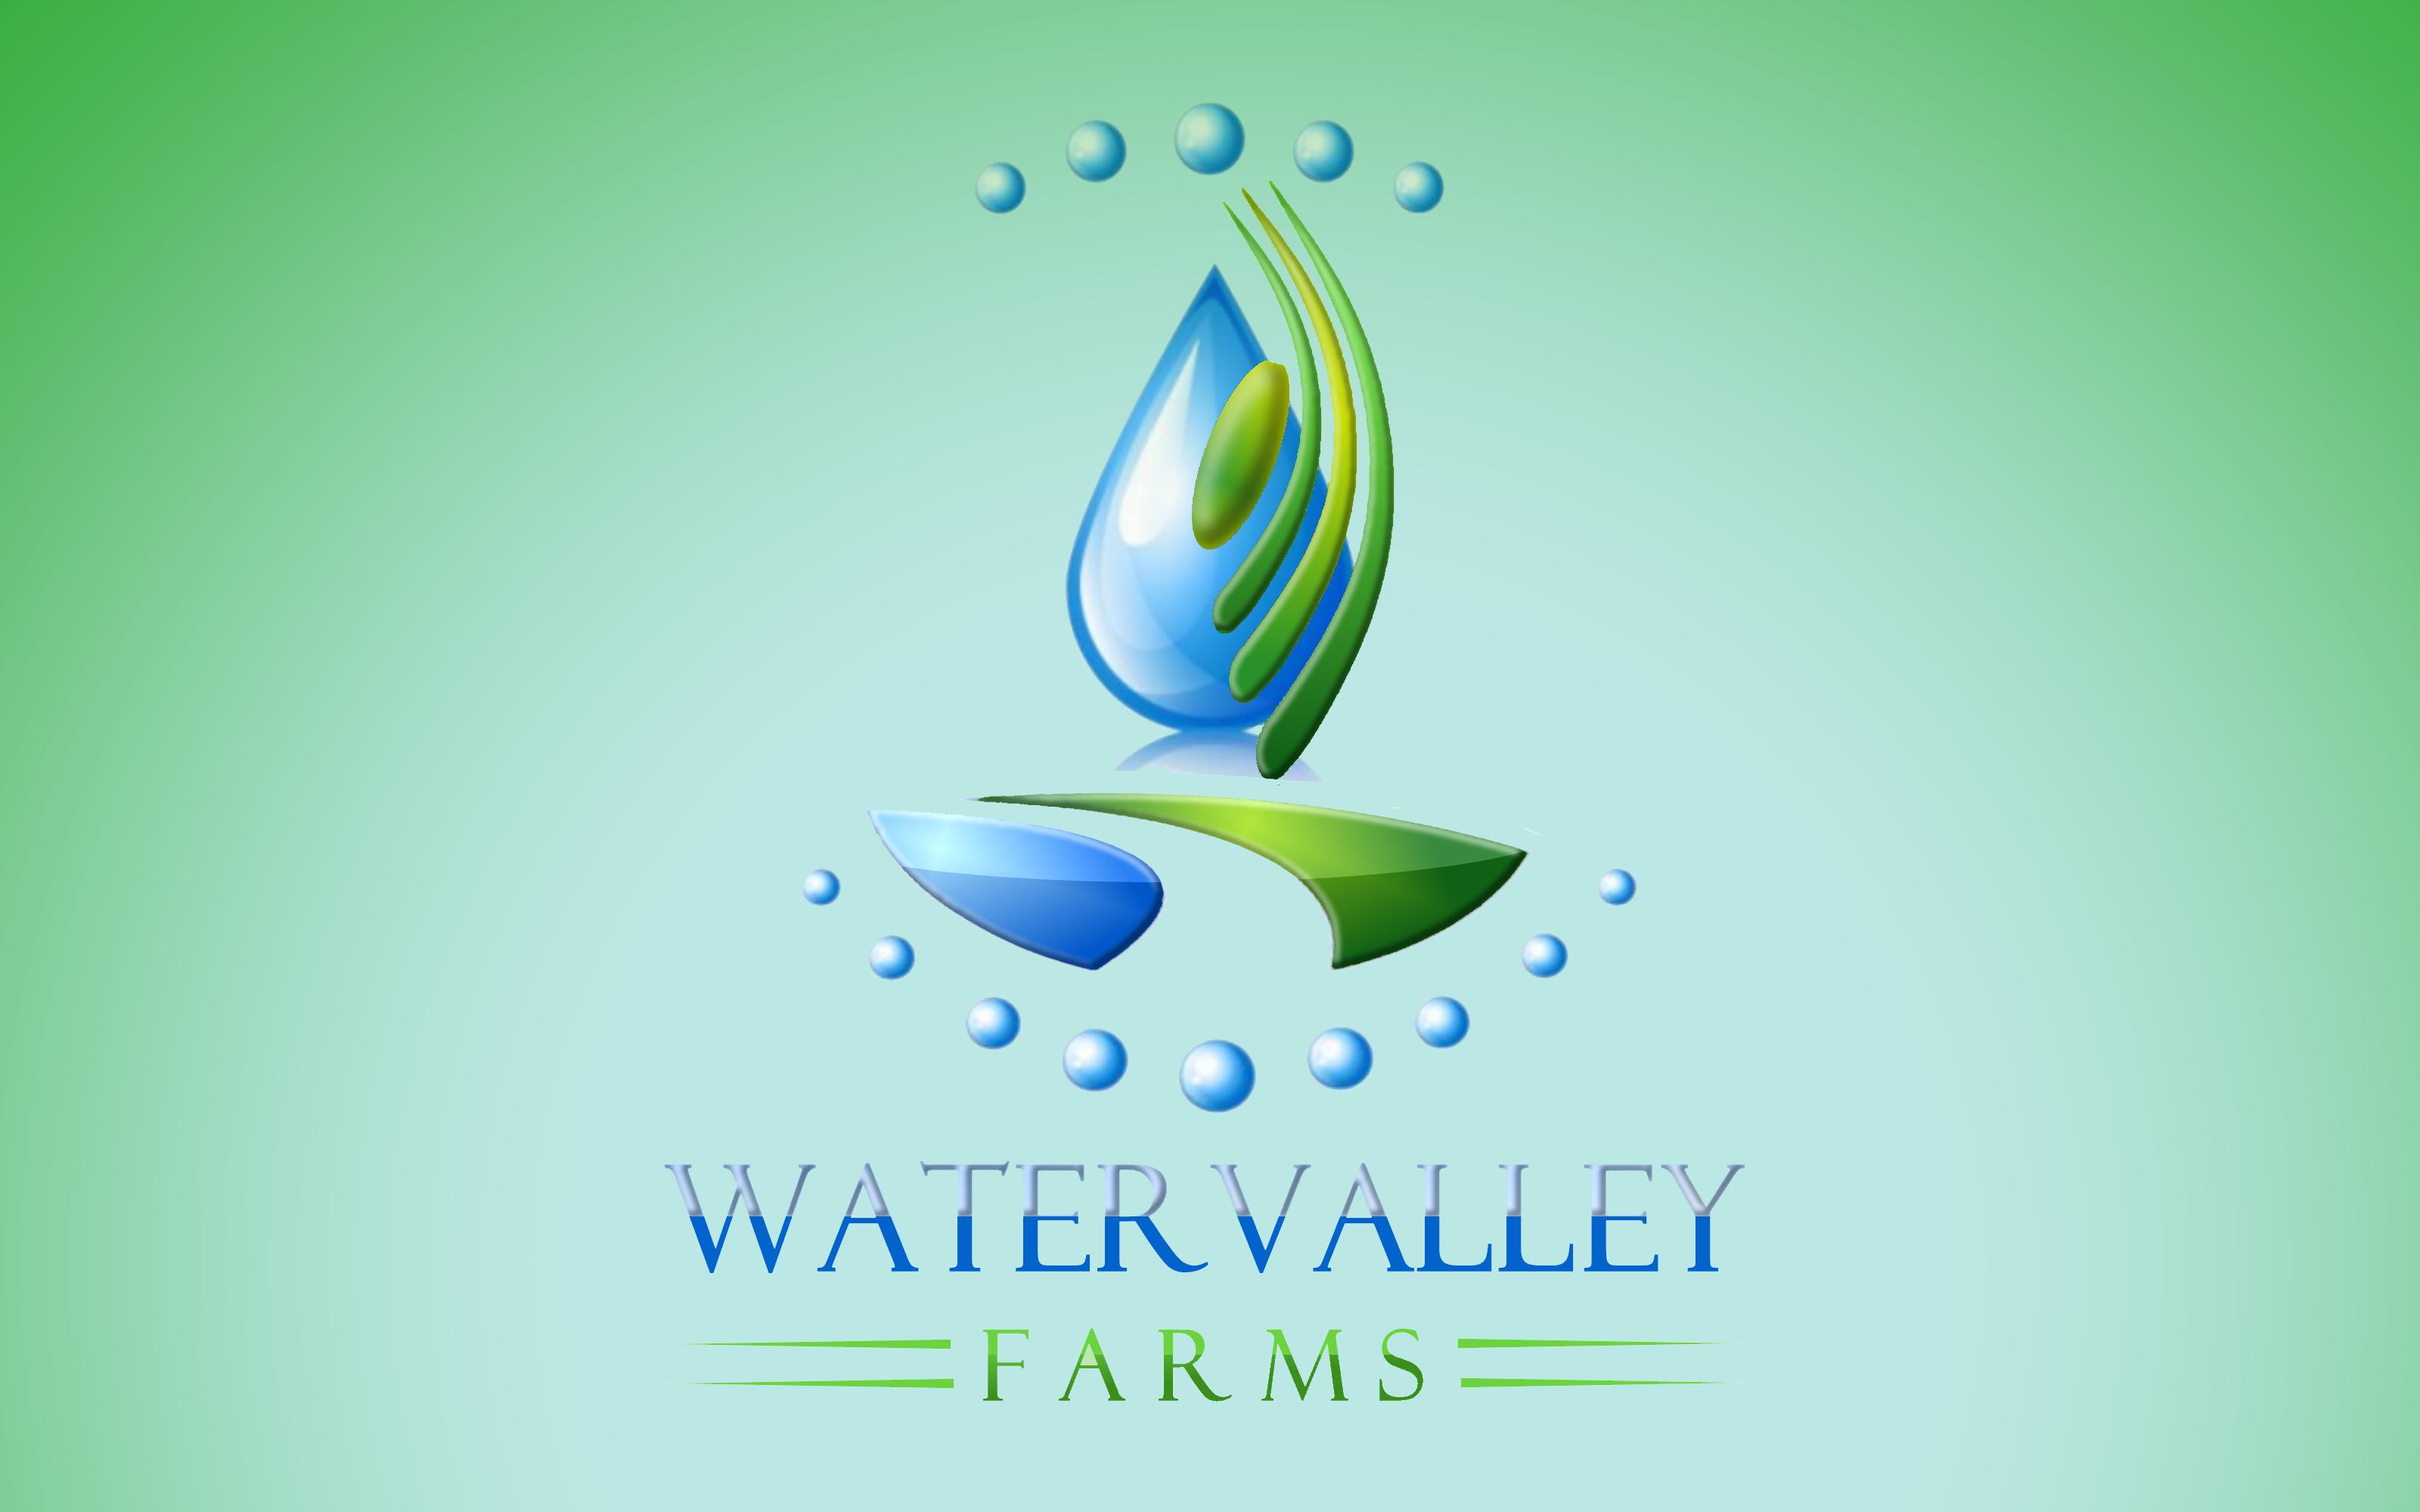 Logo Design by Roberto Bassi - Entry No. 27 in the Logo Design Contest New Logo Design for Watervalley Farms.